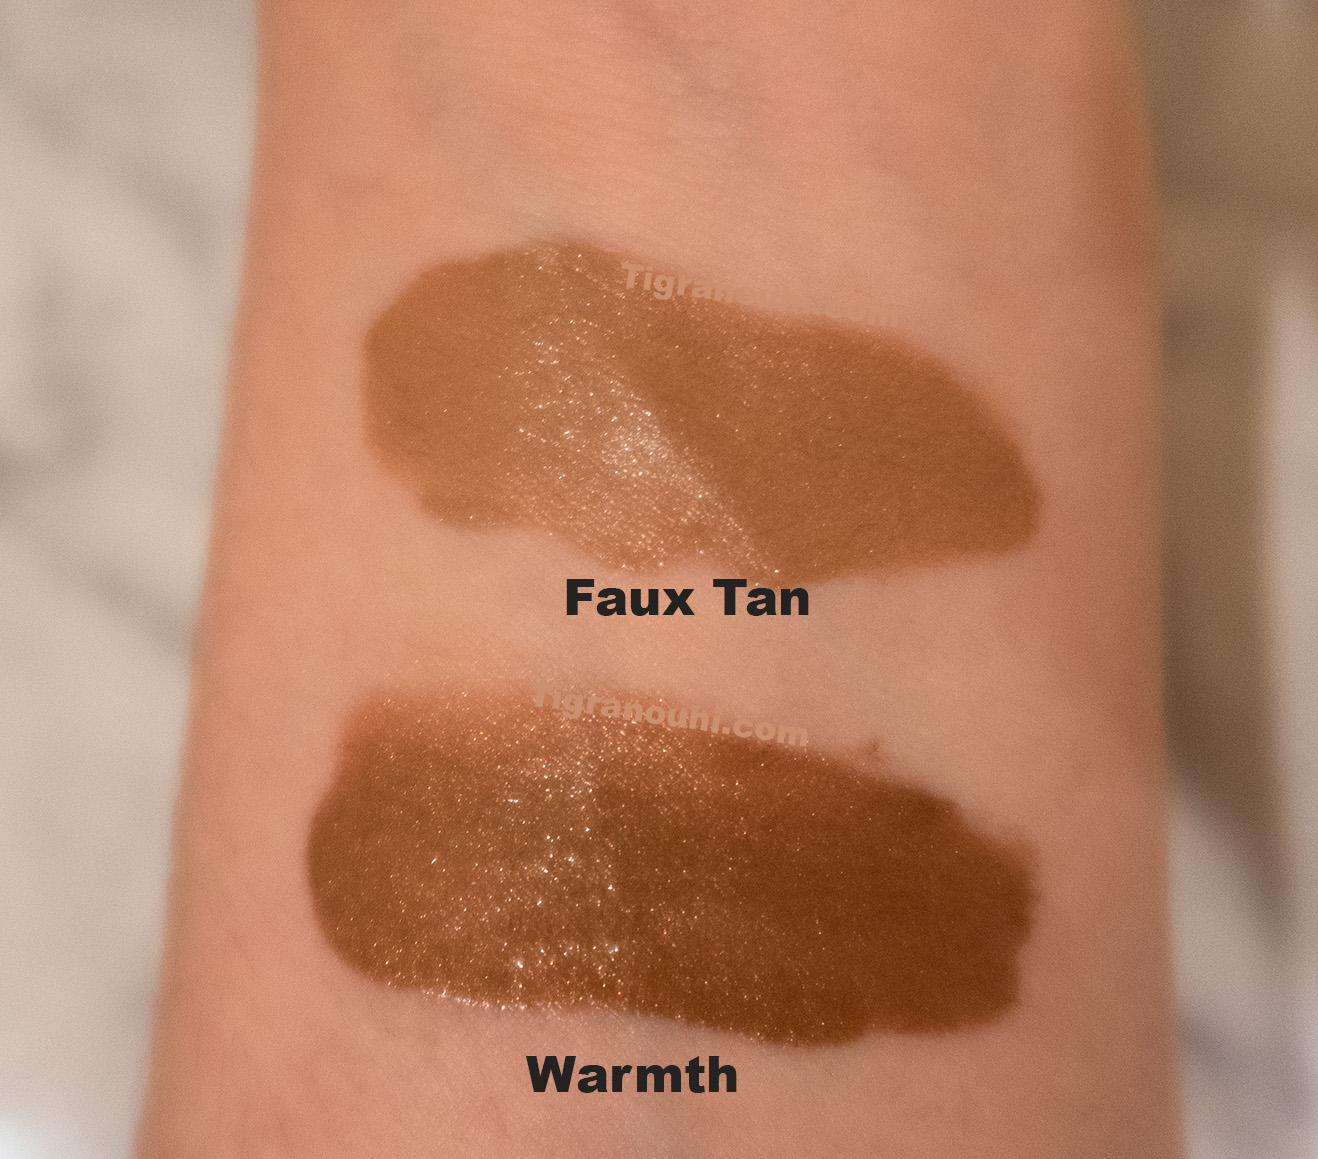 bareminerals faux tan face